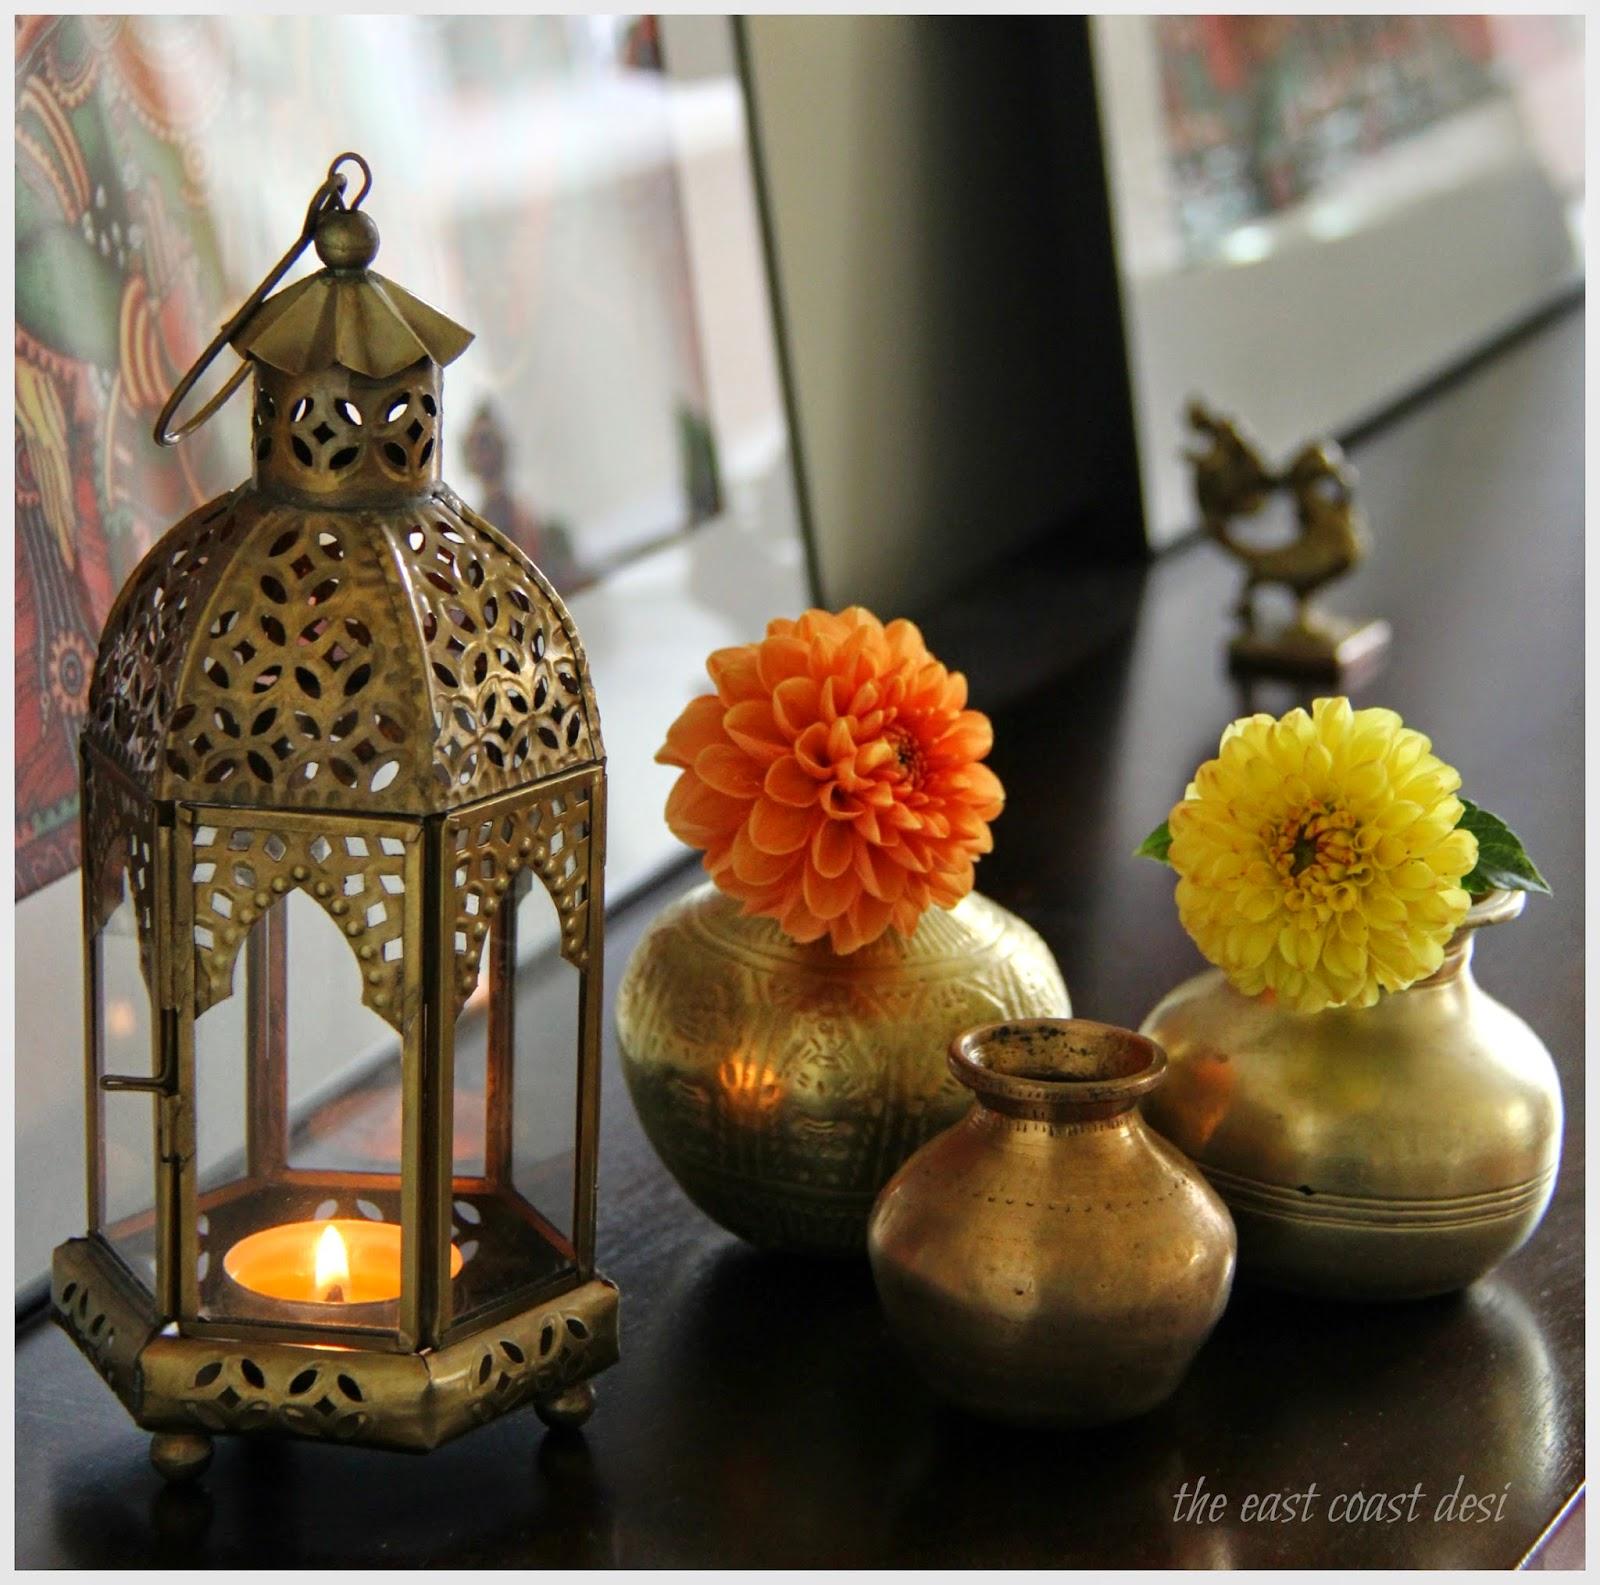 2017 Diwali Home Decor: Best Diwali Party Theme Ideas